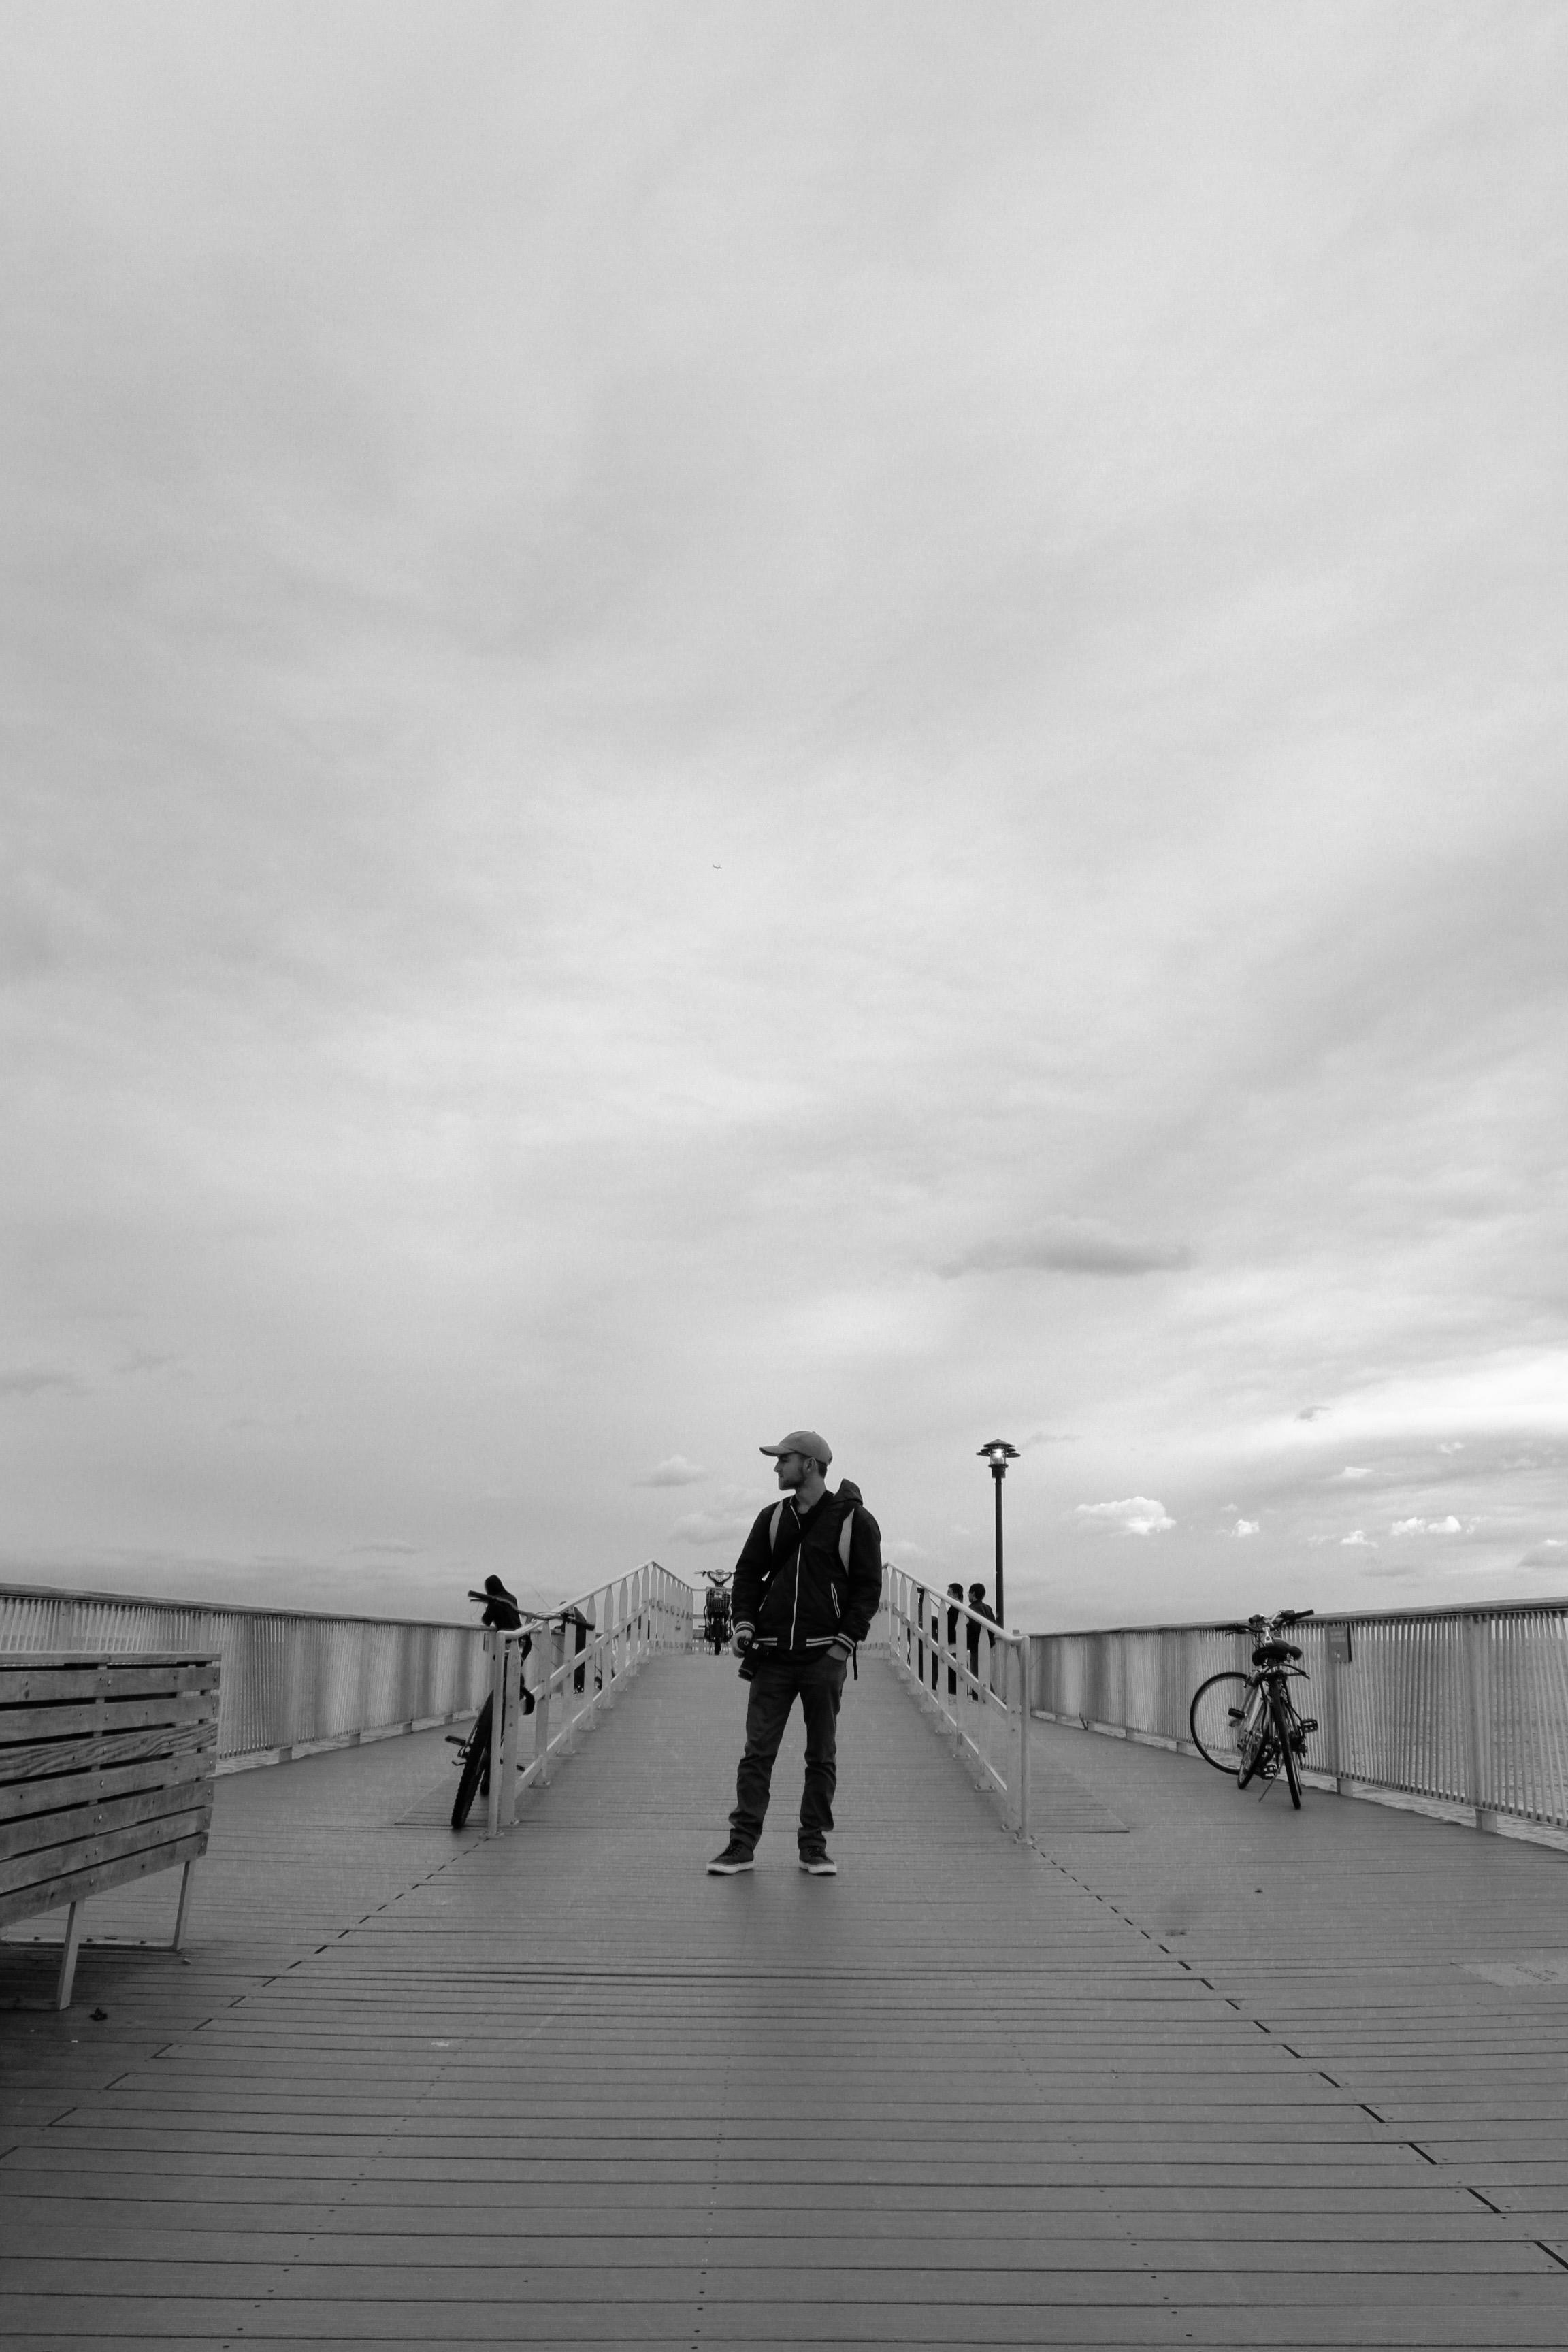 The Pier - Coney Island